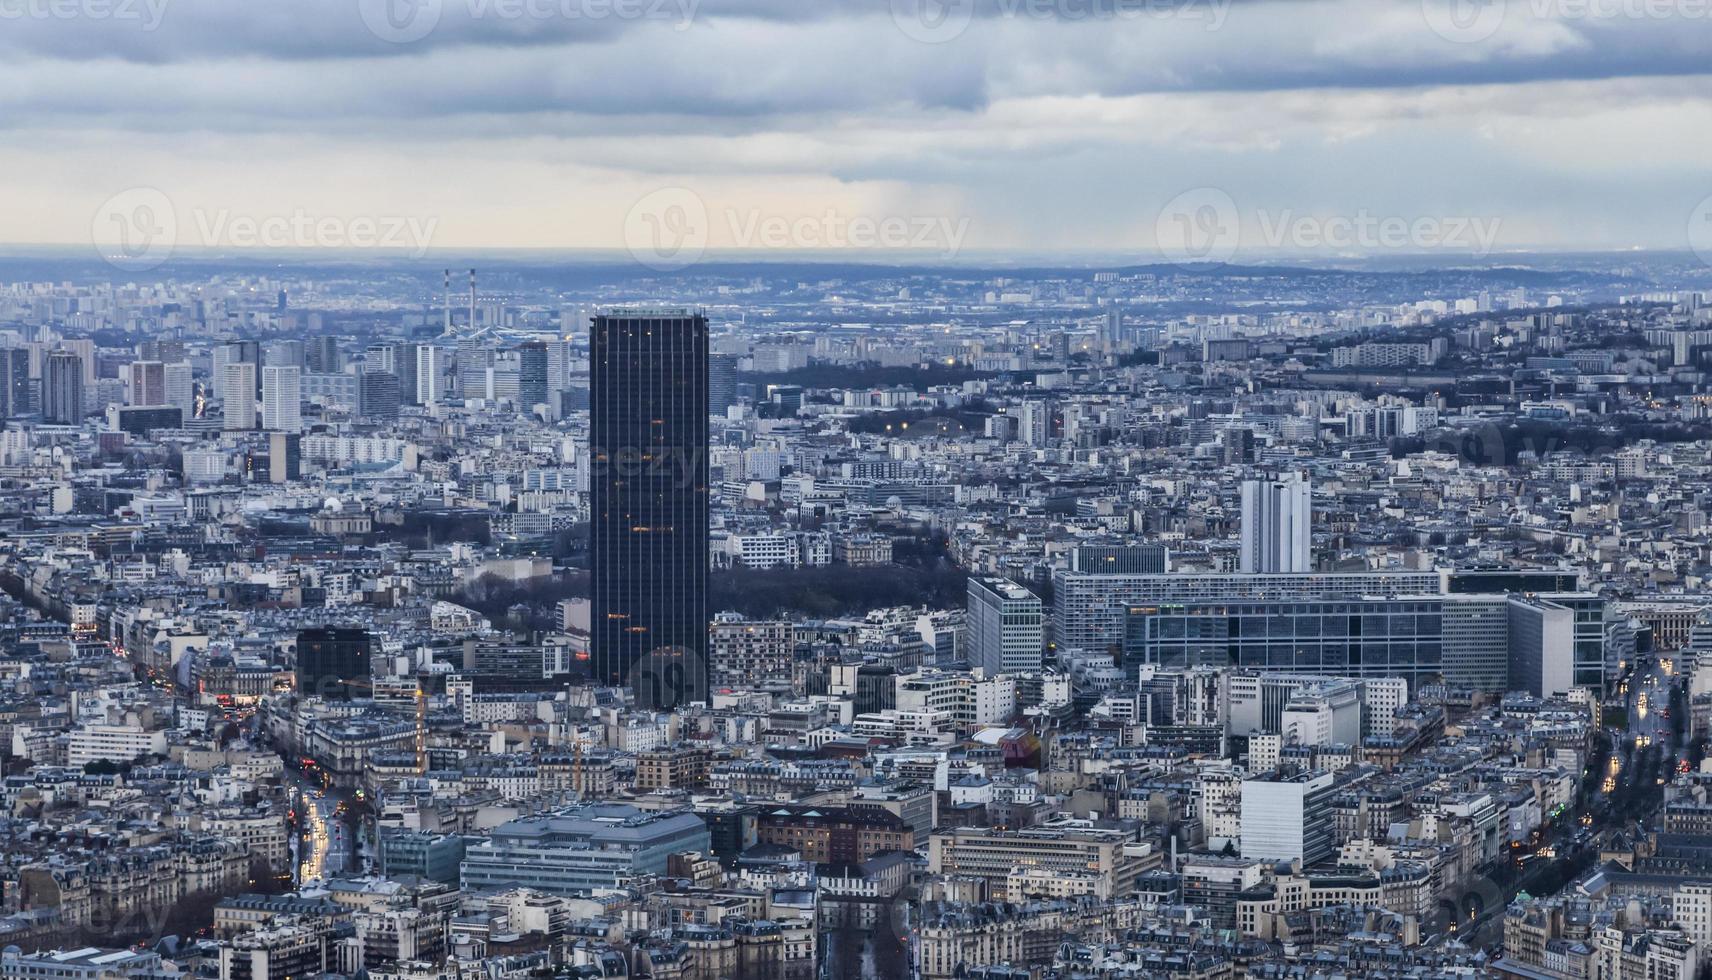 parijs - tour montparnasse foto